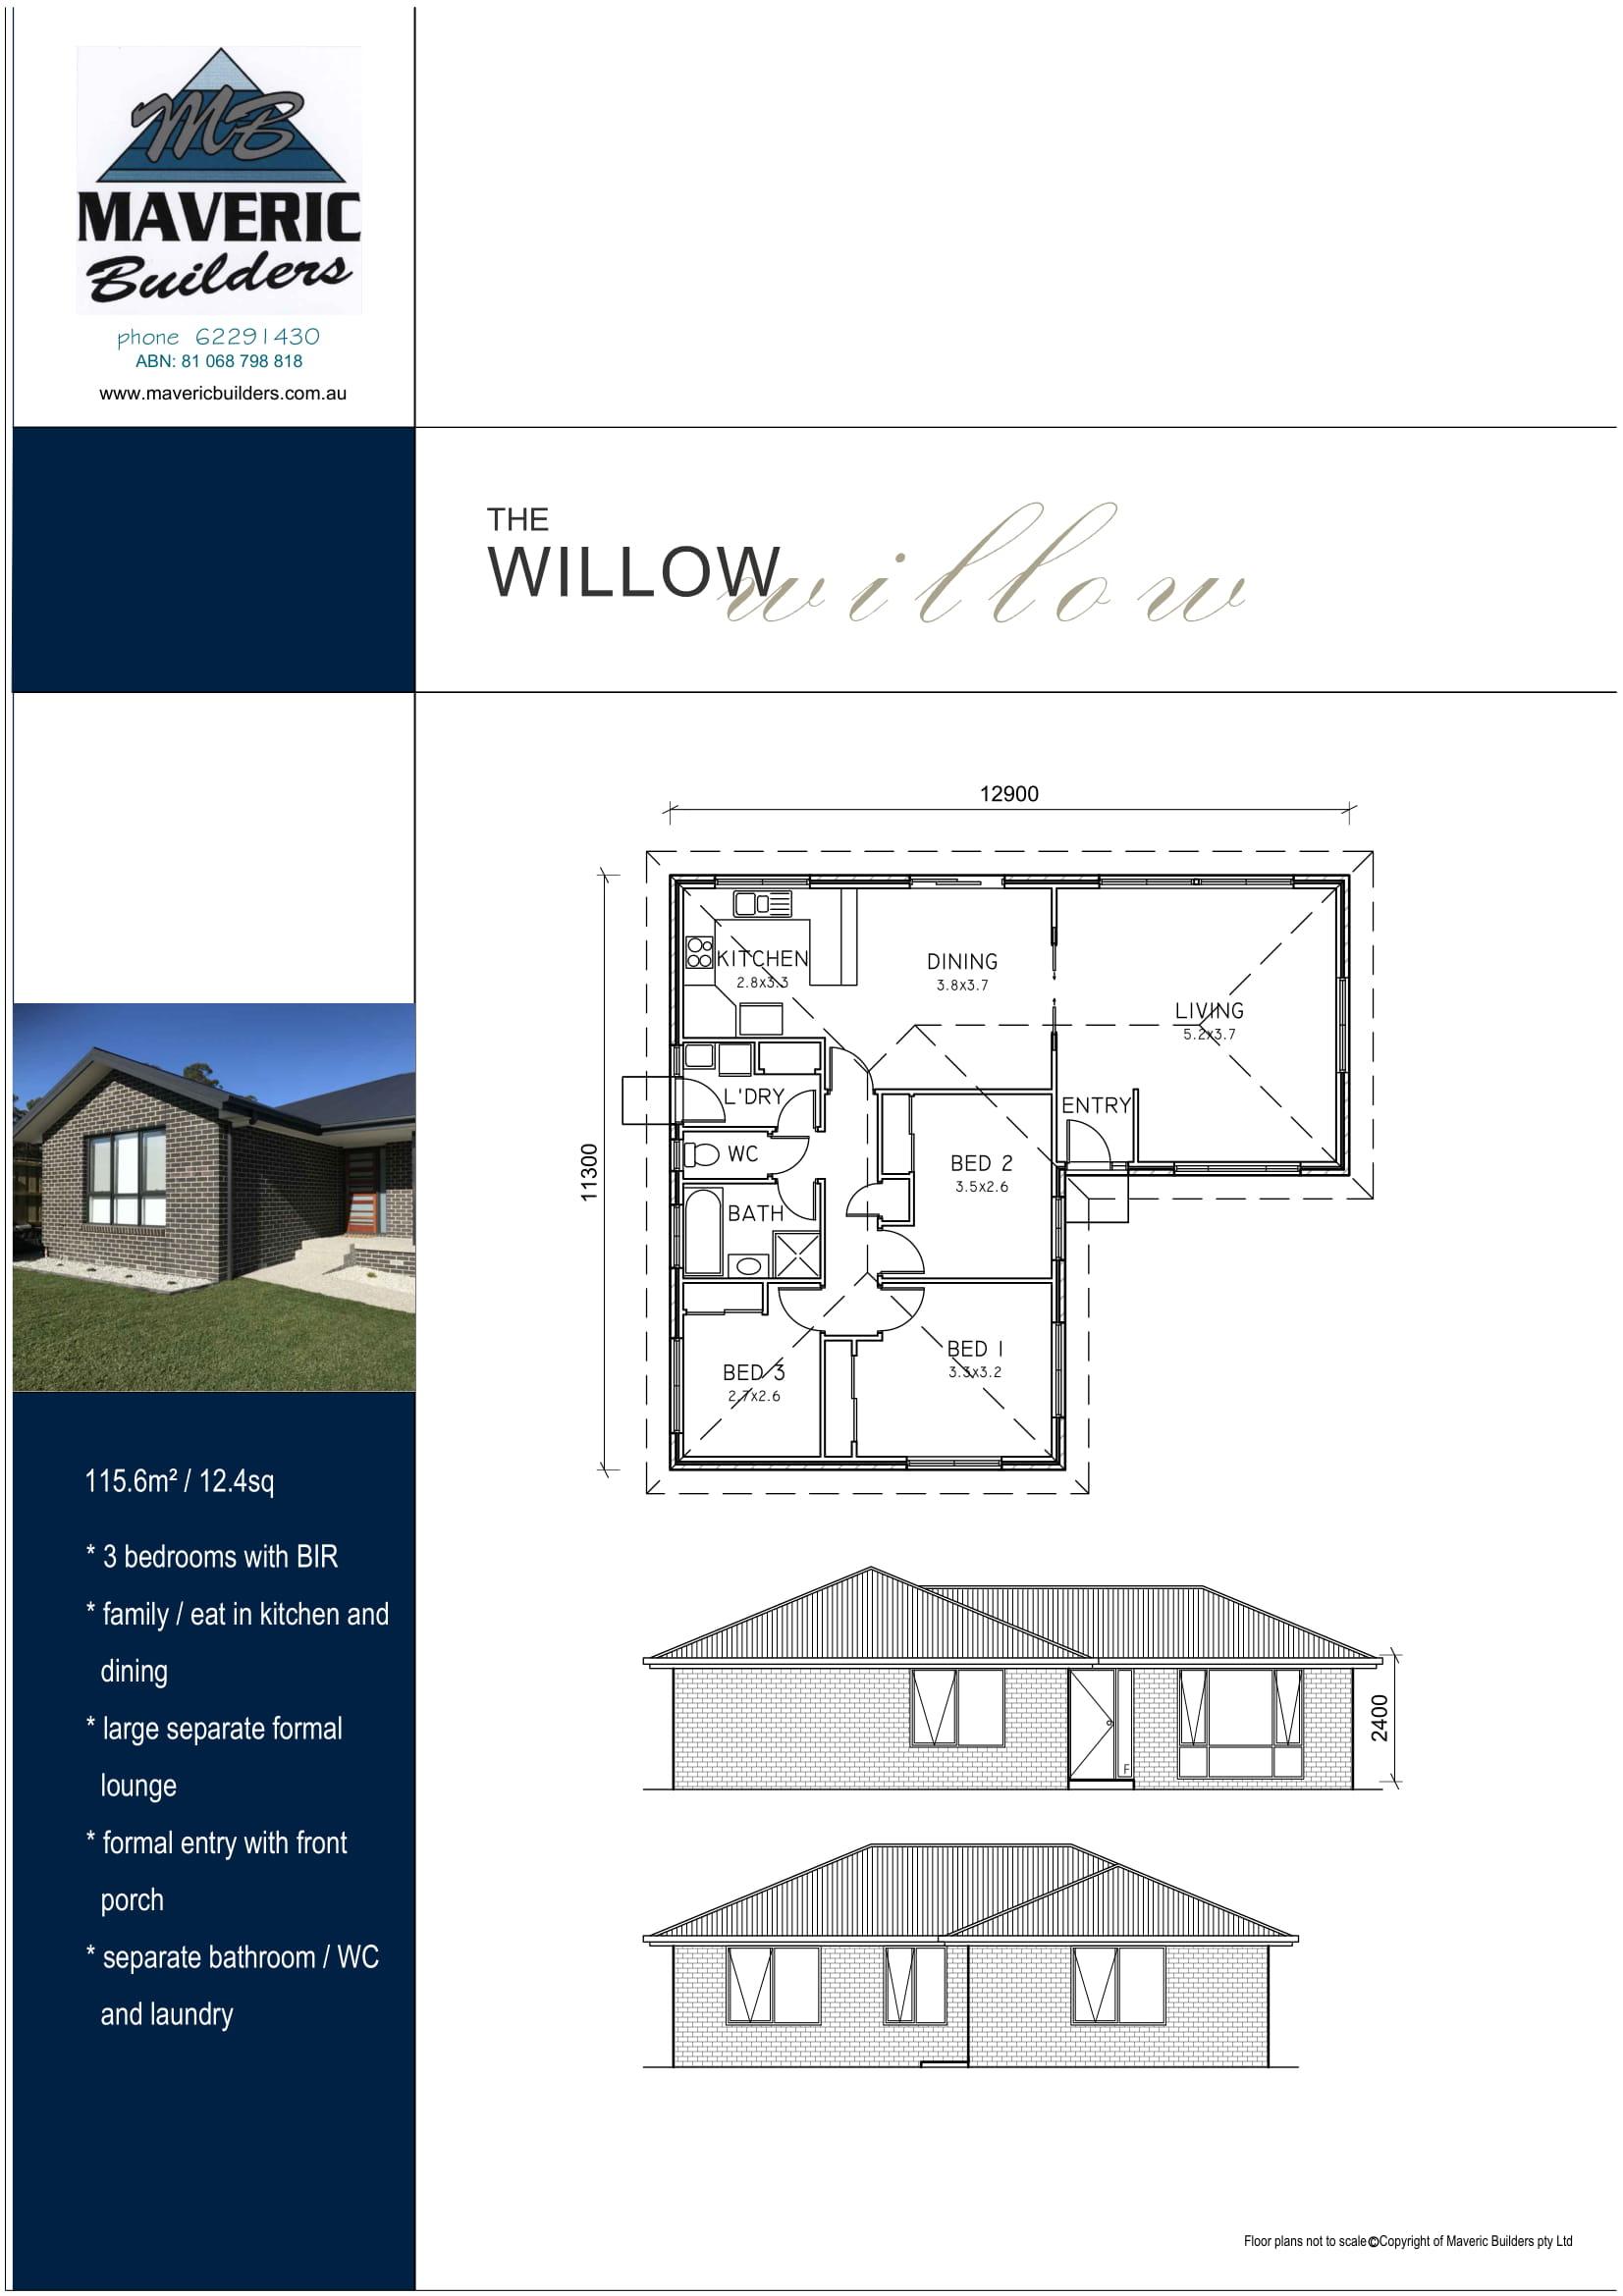 A4 Brochures 2019 01 - 24-05.jpg